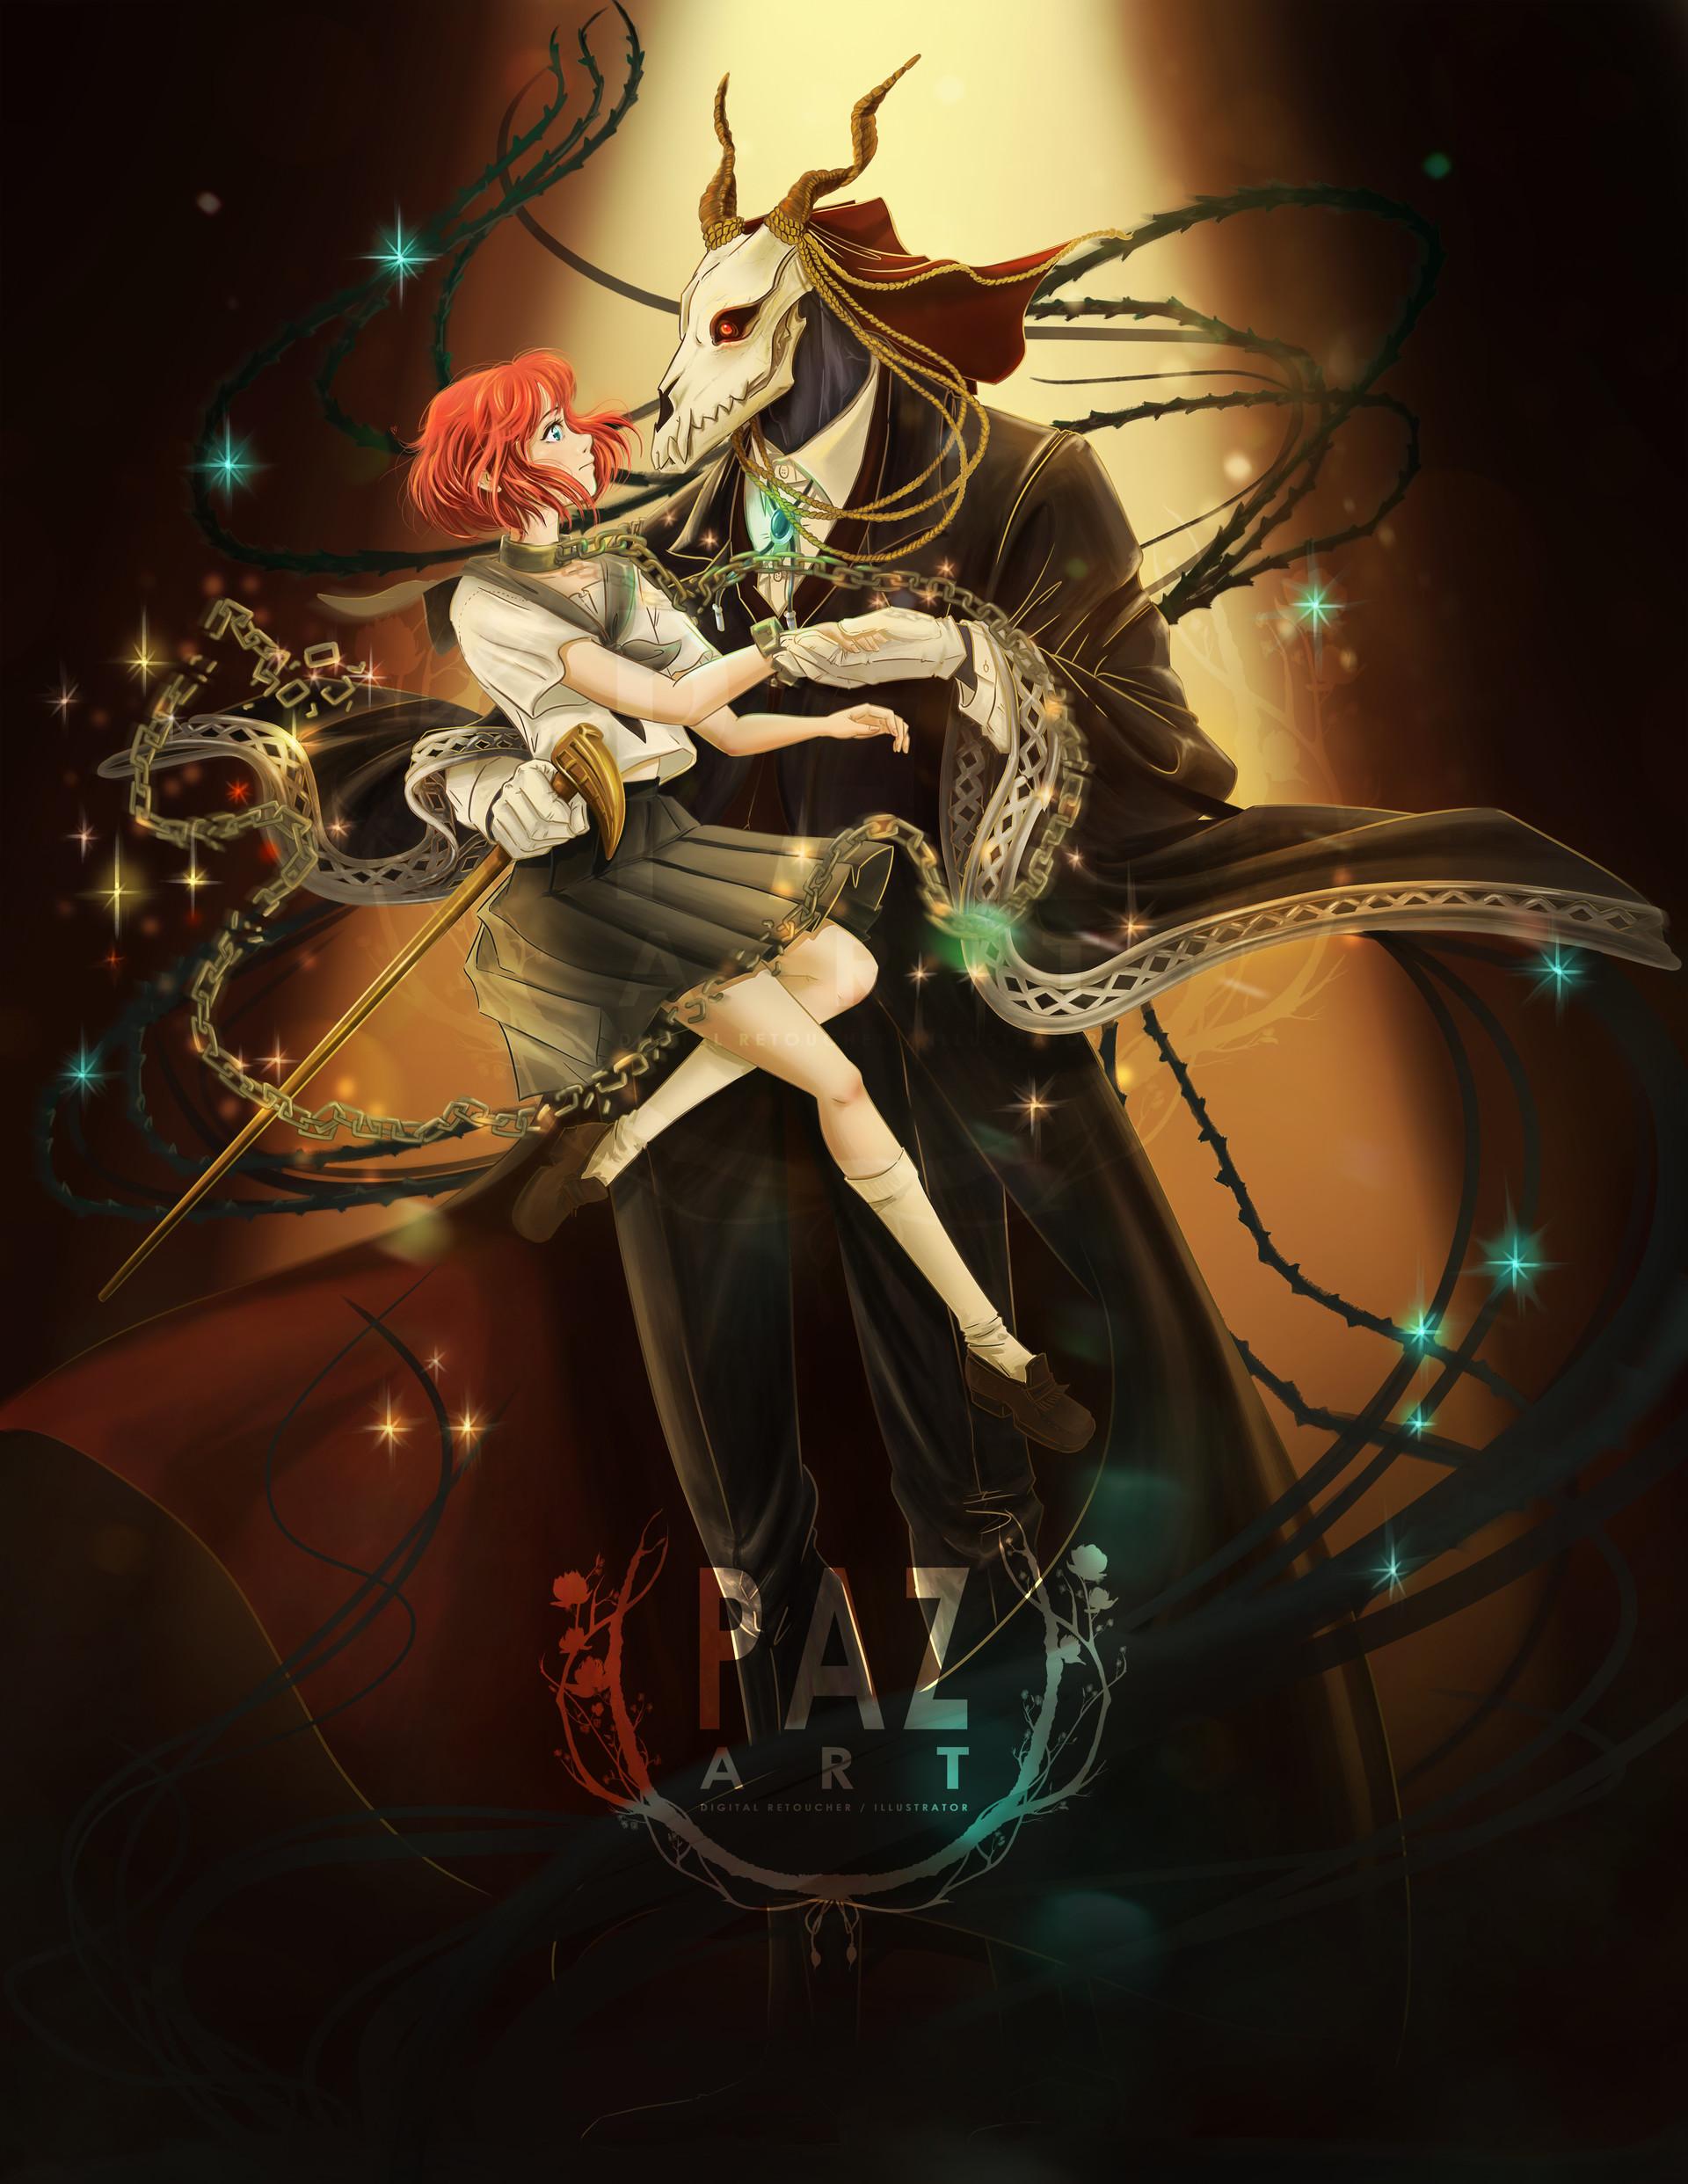 foto de ArtStation PAZ ART /RE DRAW Mahoutsukai No Yome Pazu (Mª Paz Arriagada Lara)